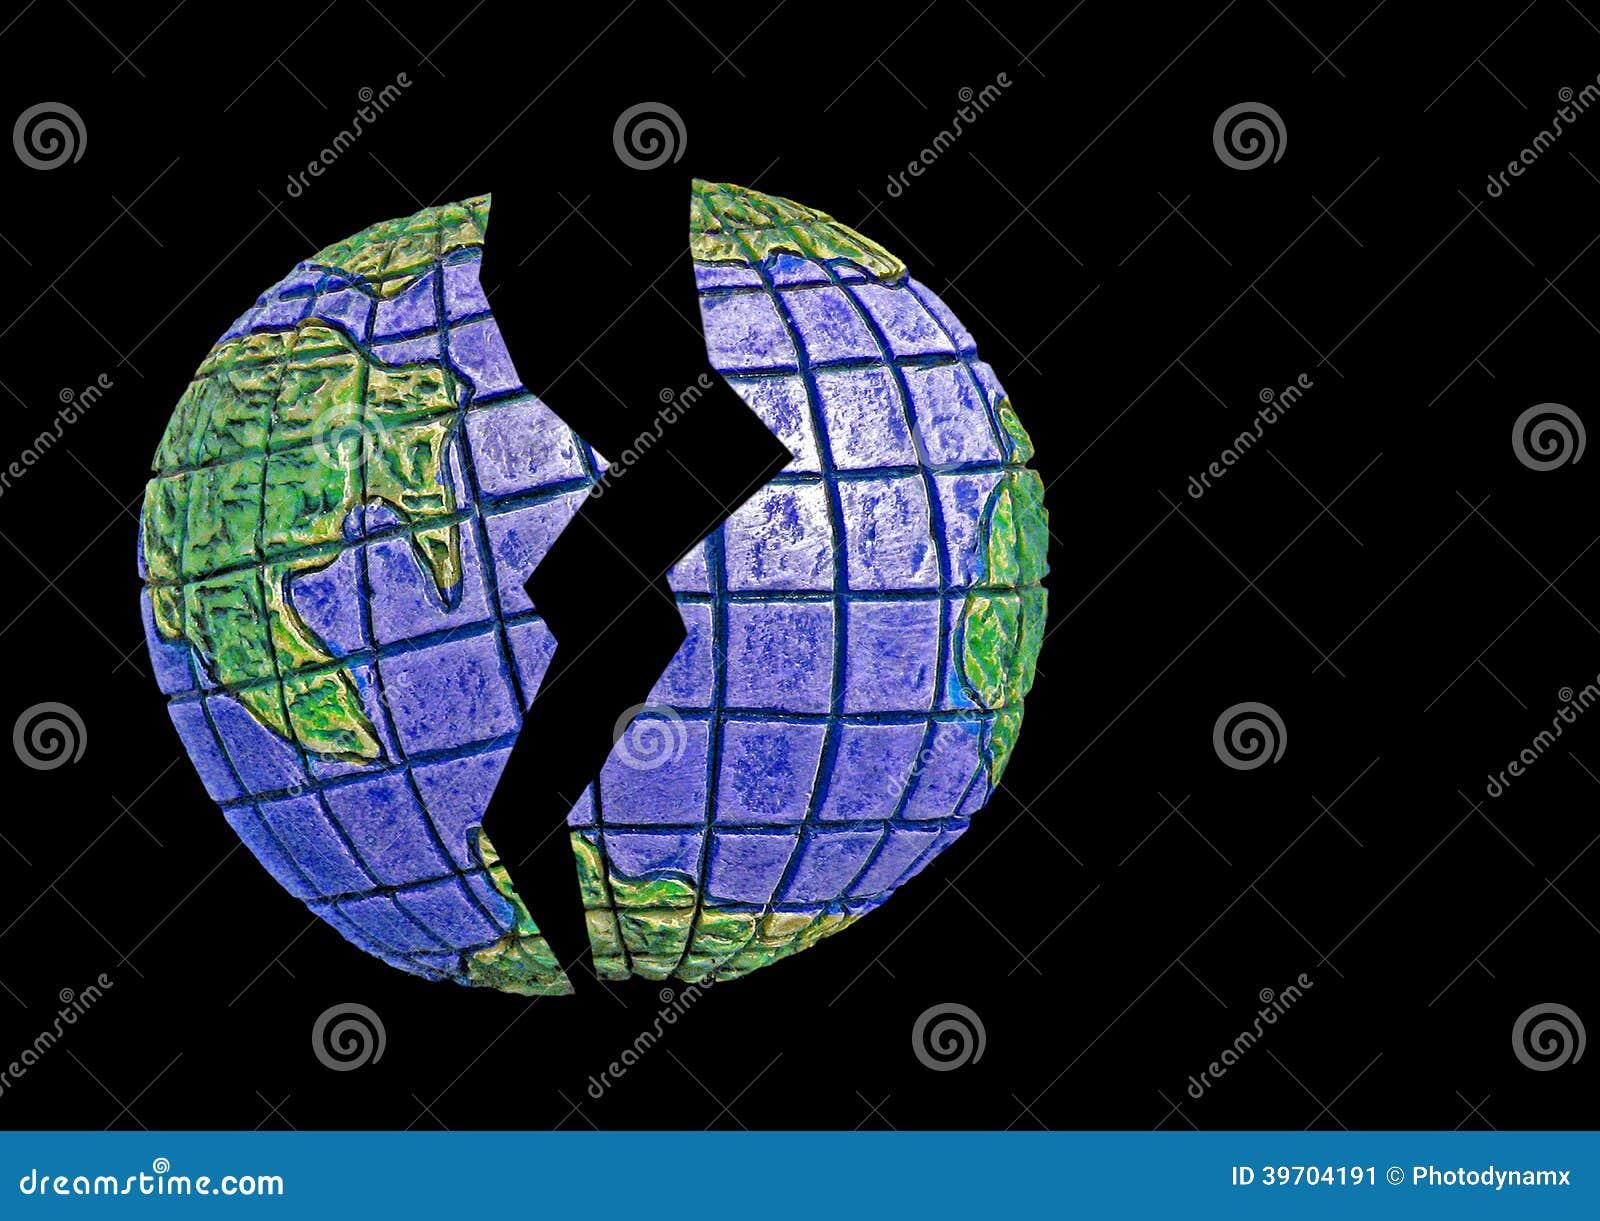 Broken Earth Stock Photo Image 39704191